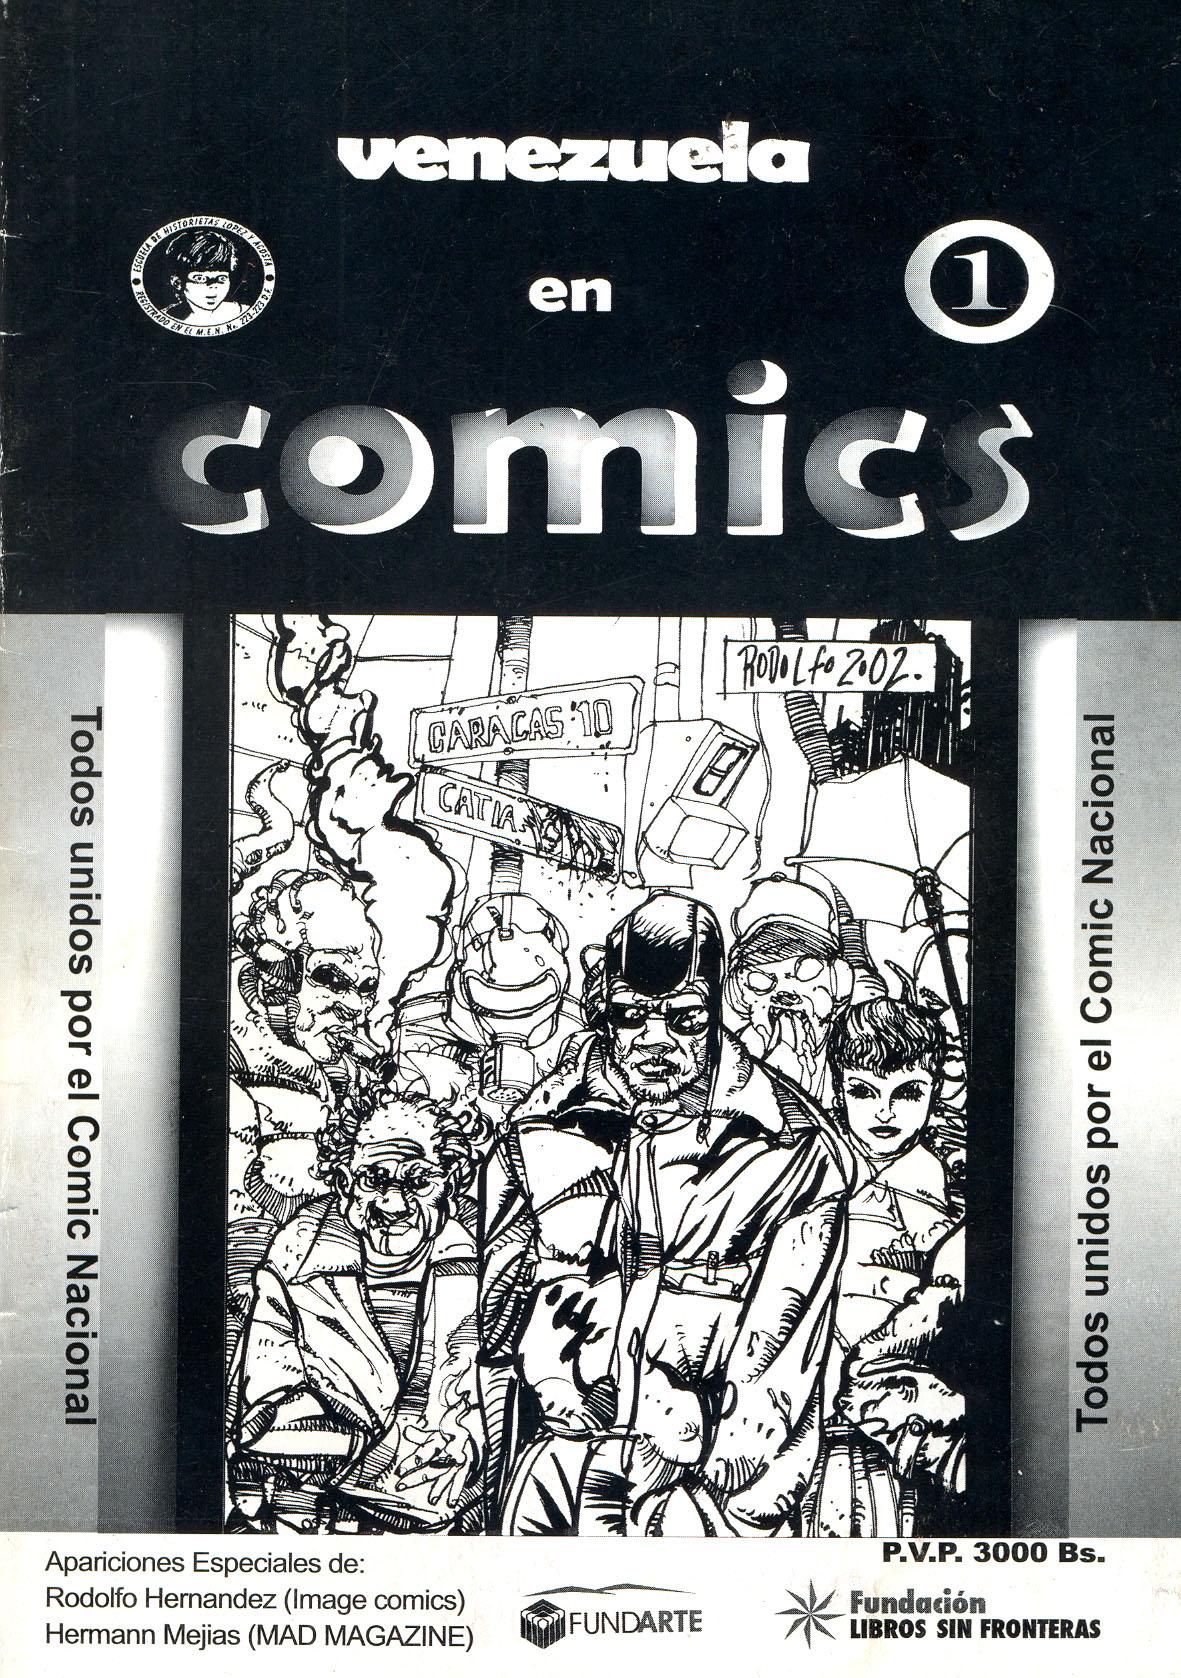 Revista Venezuela en Cómics